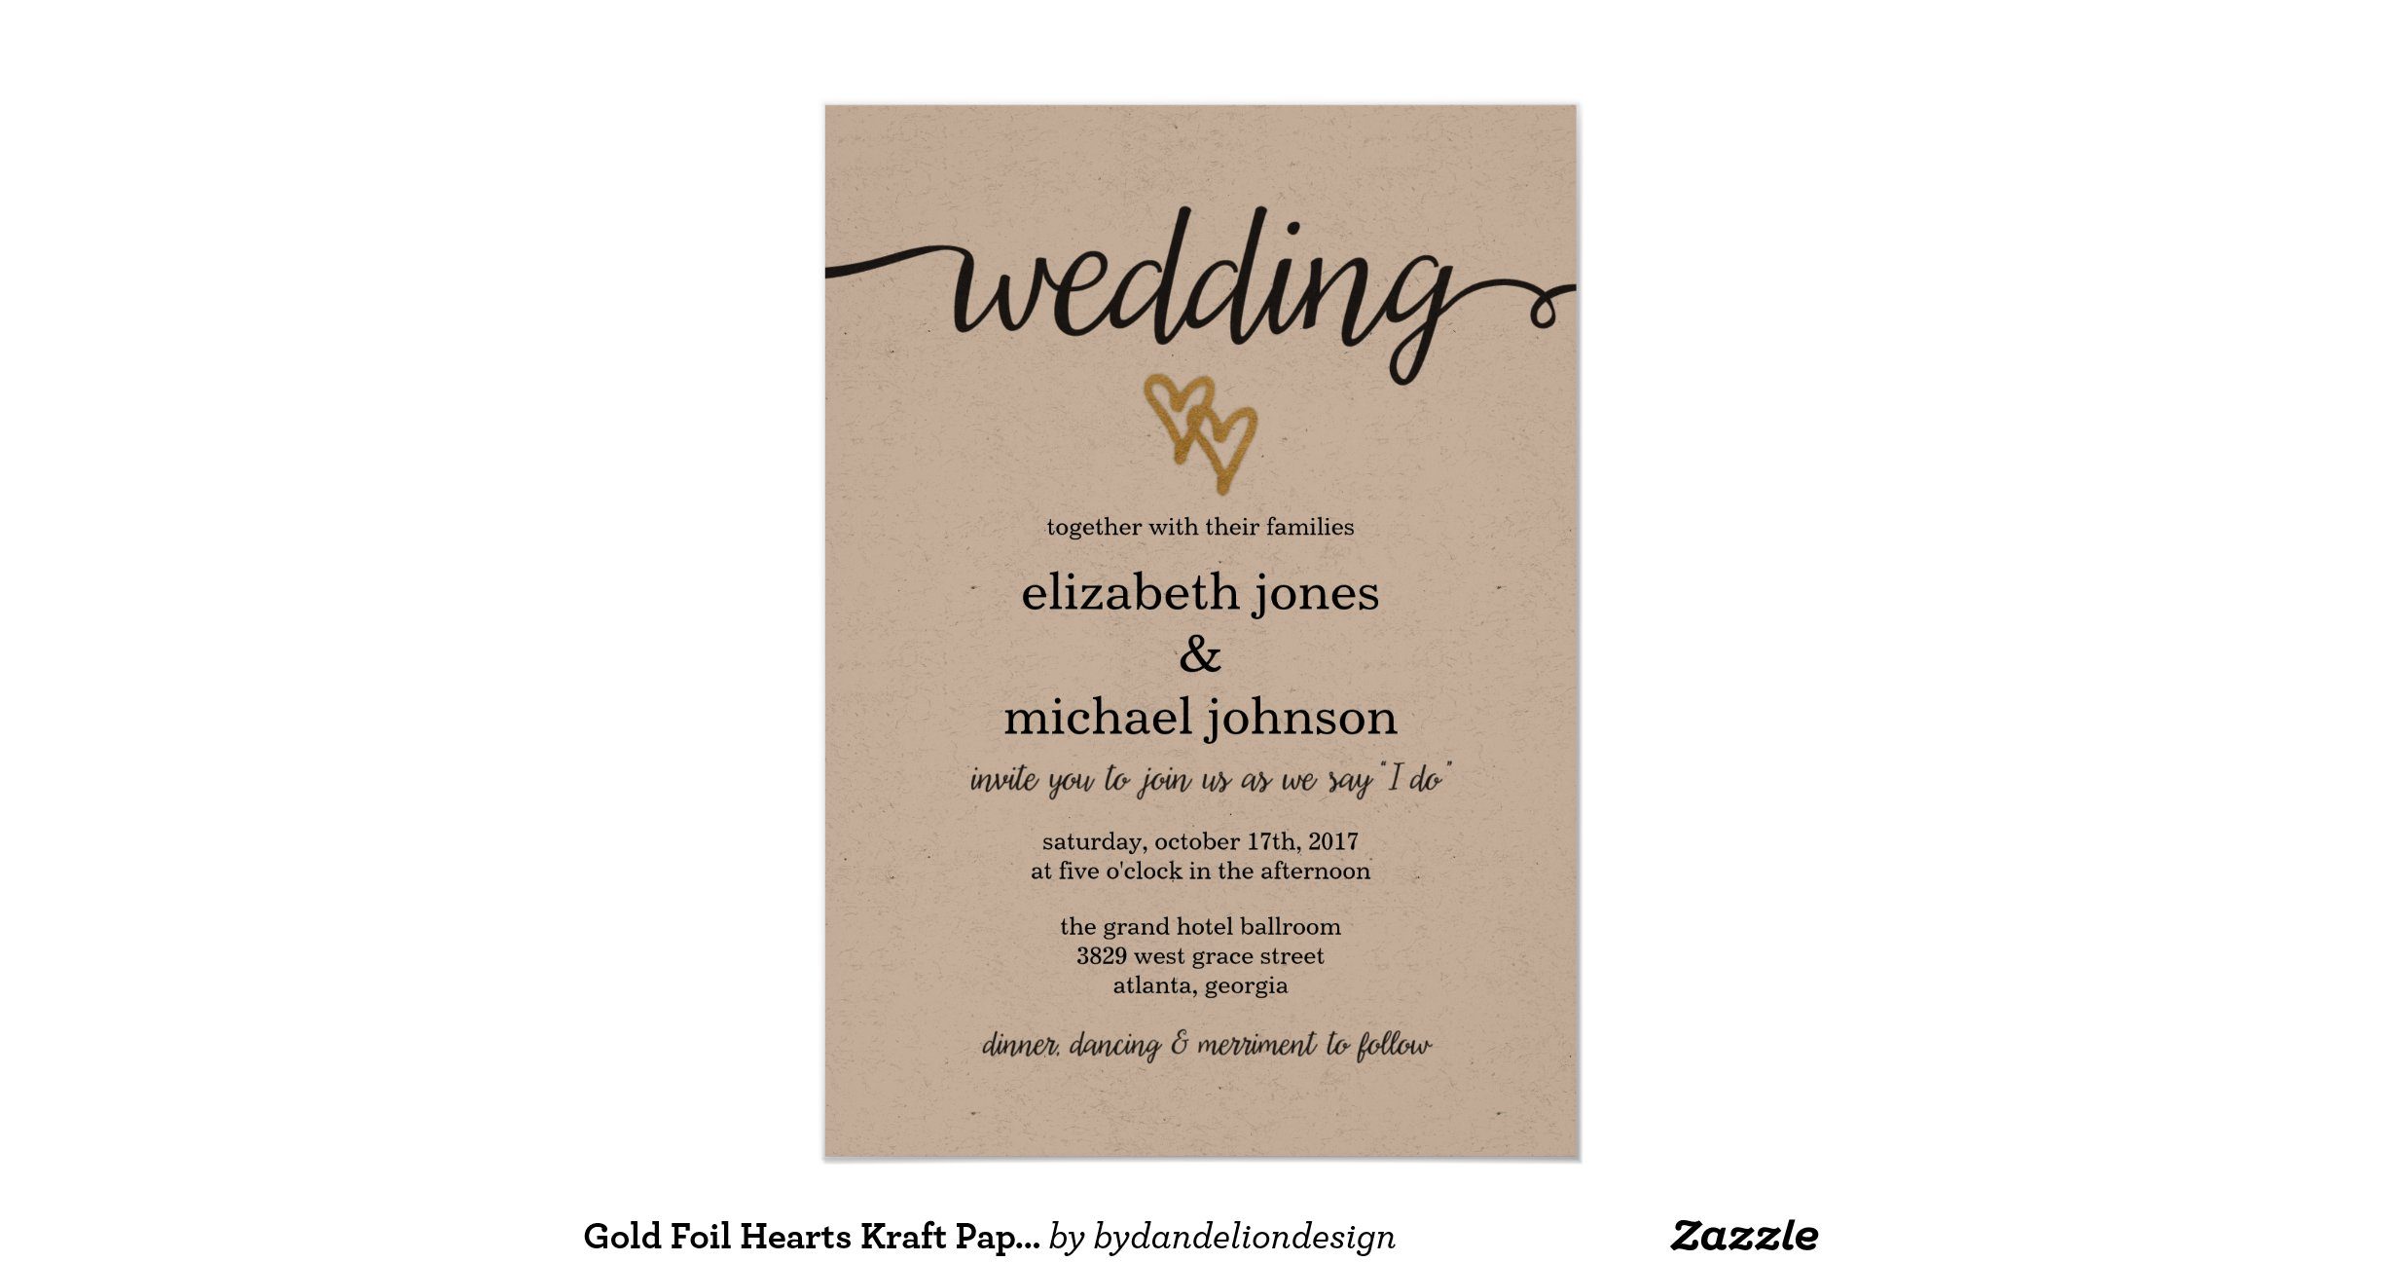 wedding invitations using kraft paper - 28 images - diy tutorial ...